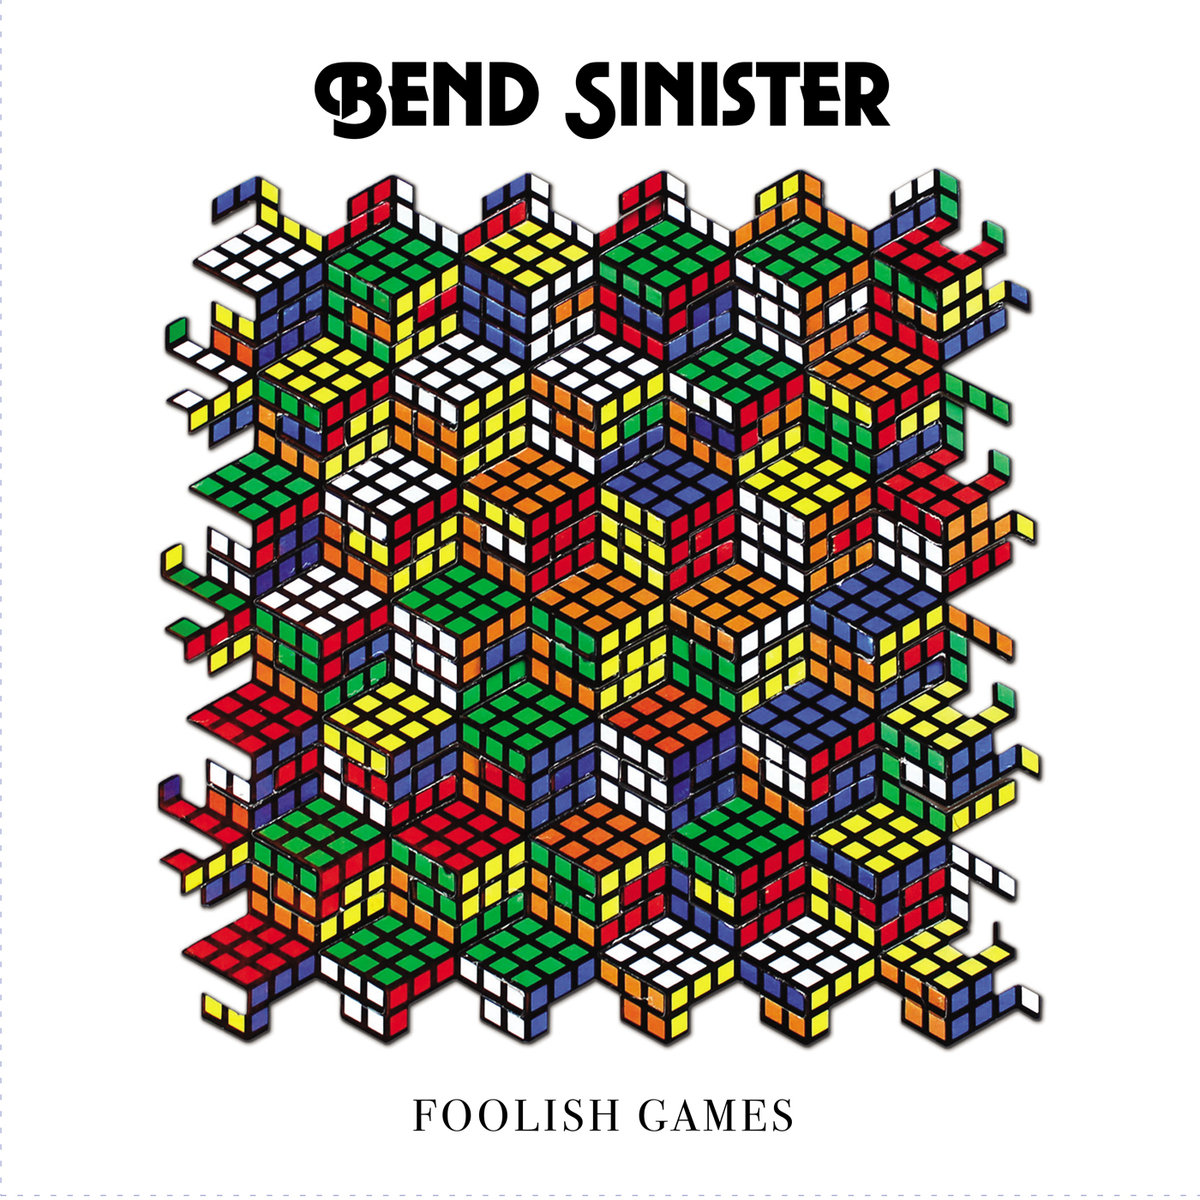 Bend Sinister -Foolish Games  Release date :June 8, 2018  Label :Cordova Bay  Credit :Mixer